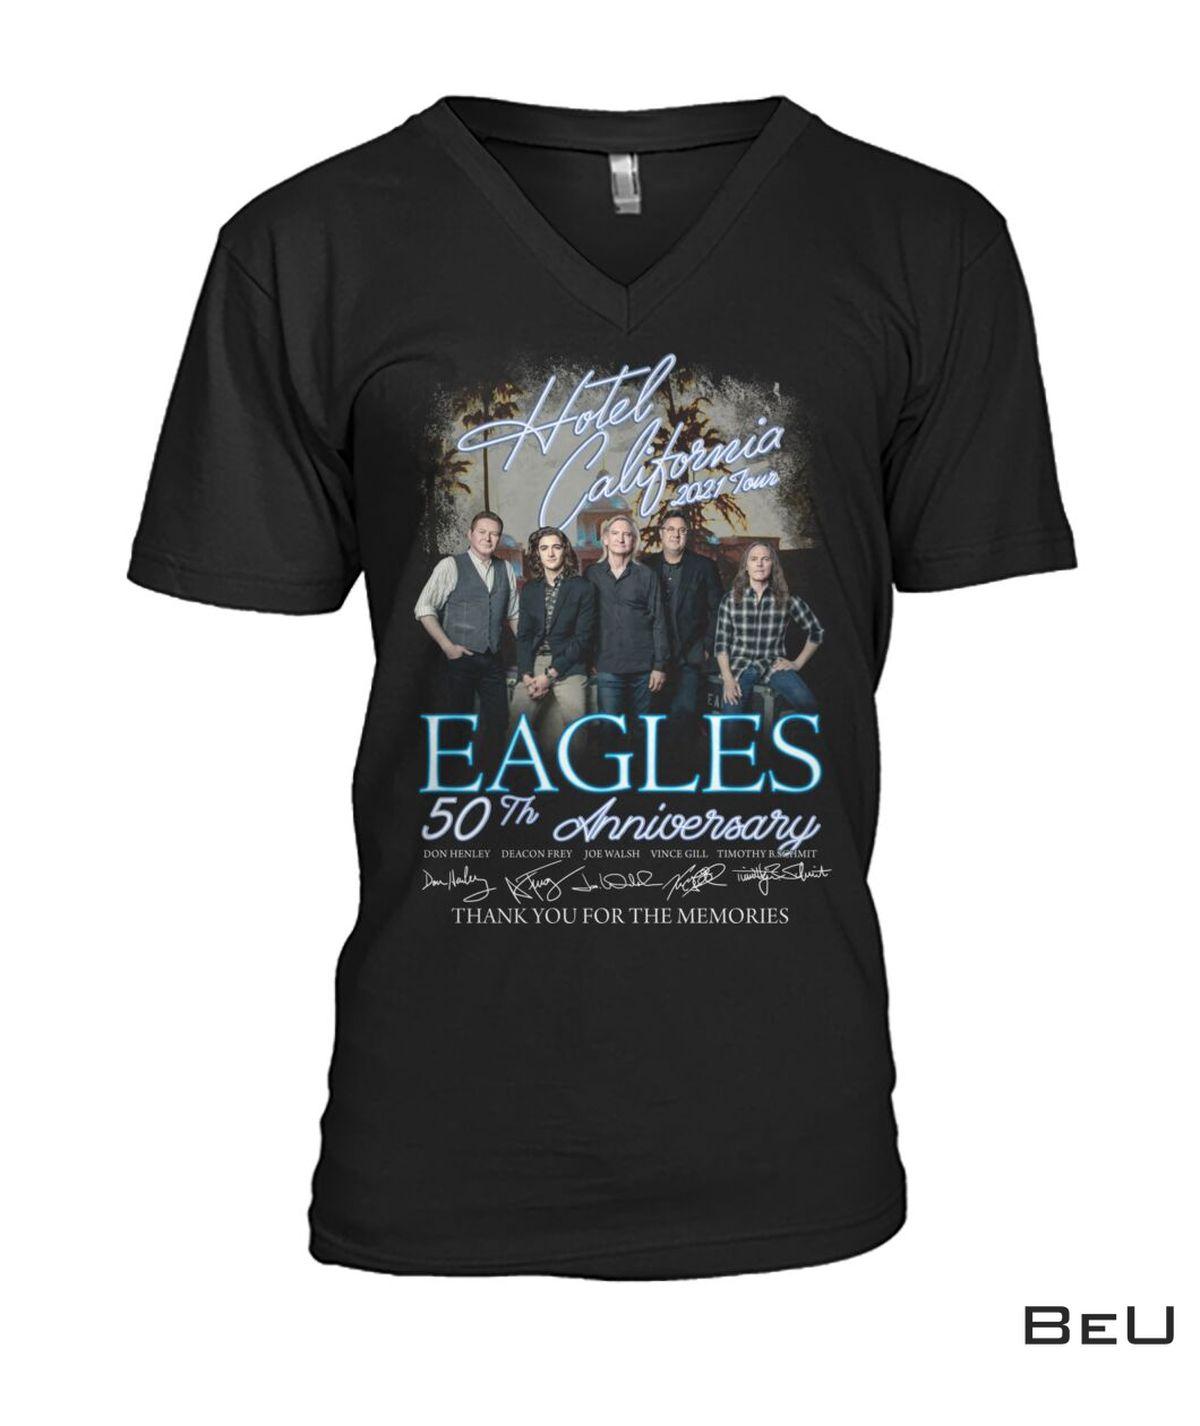 All Over Print Hotel California 2021 Tour Eagles 50th Anniversary Shirt, hoodie, tank top